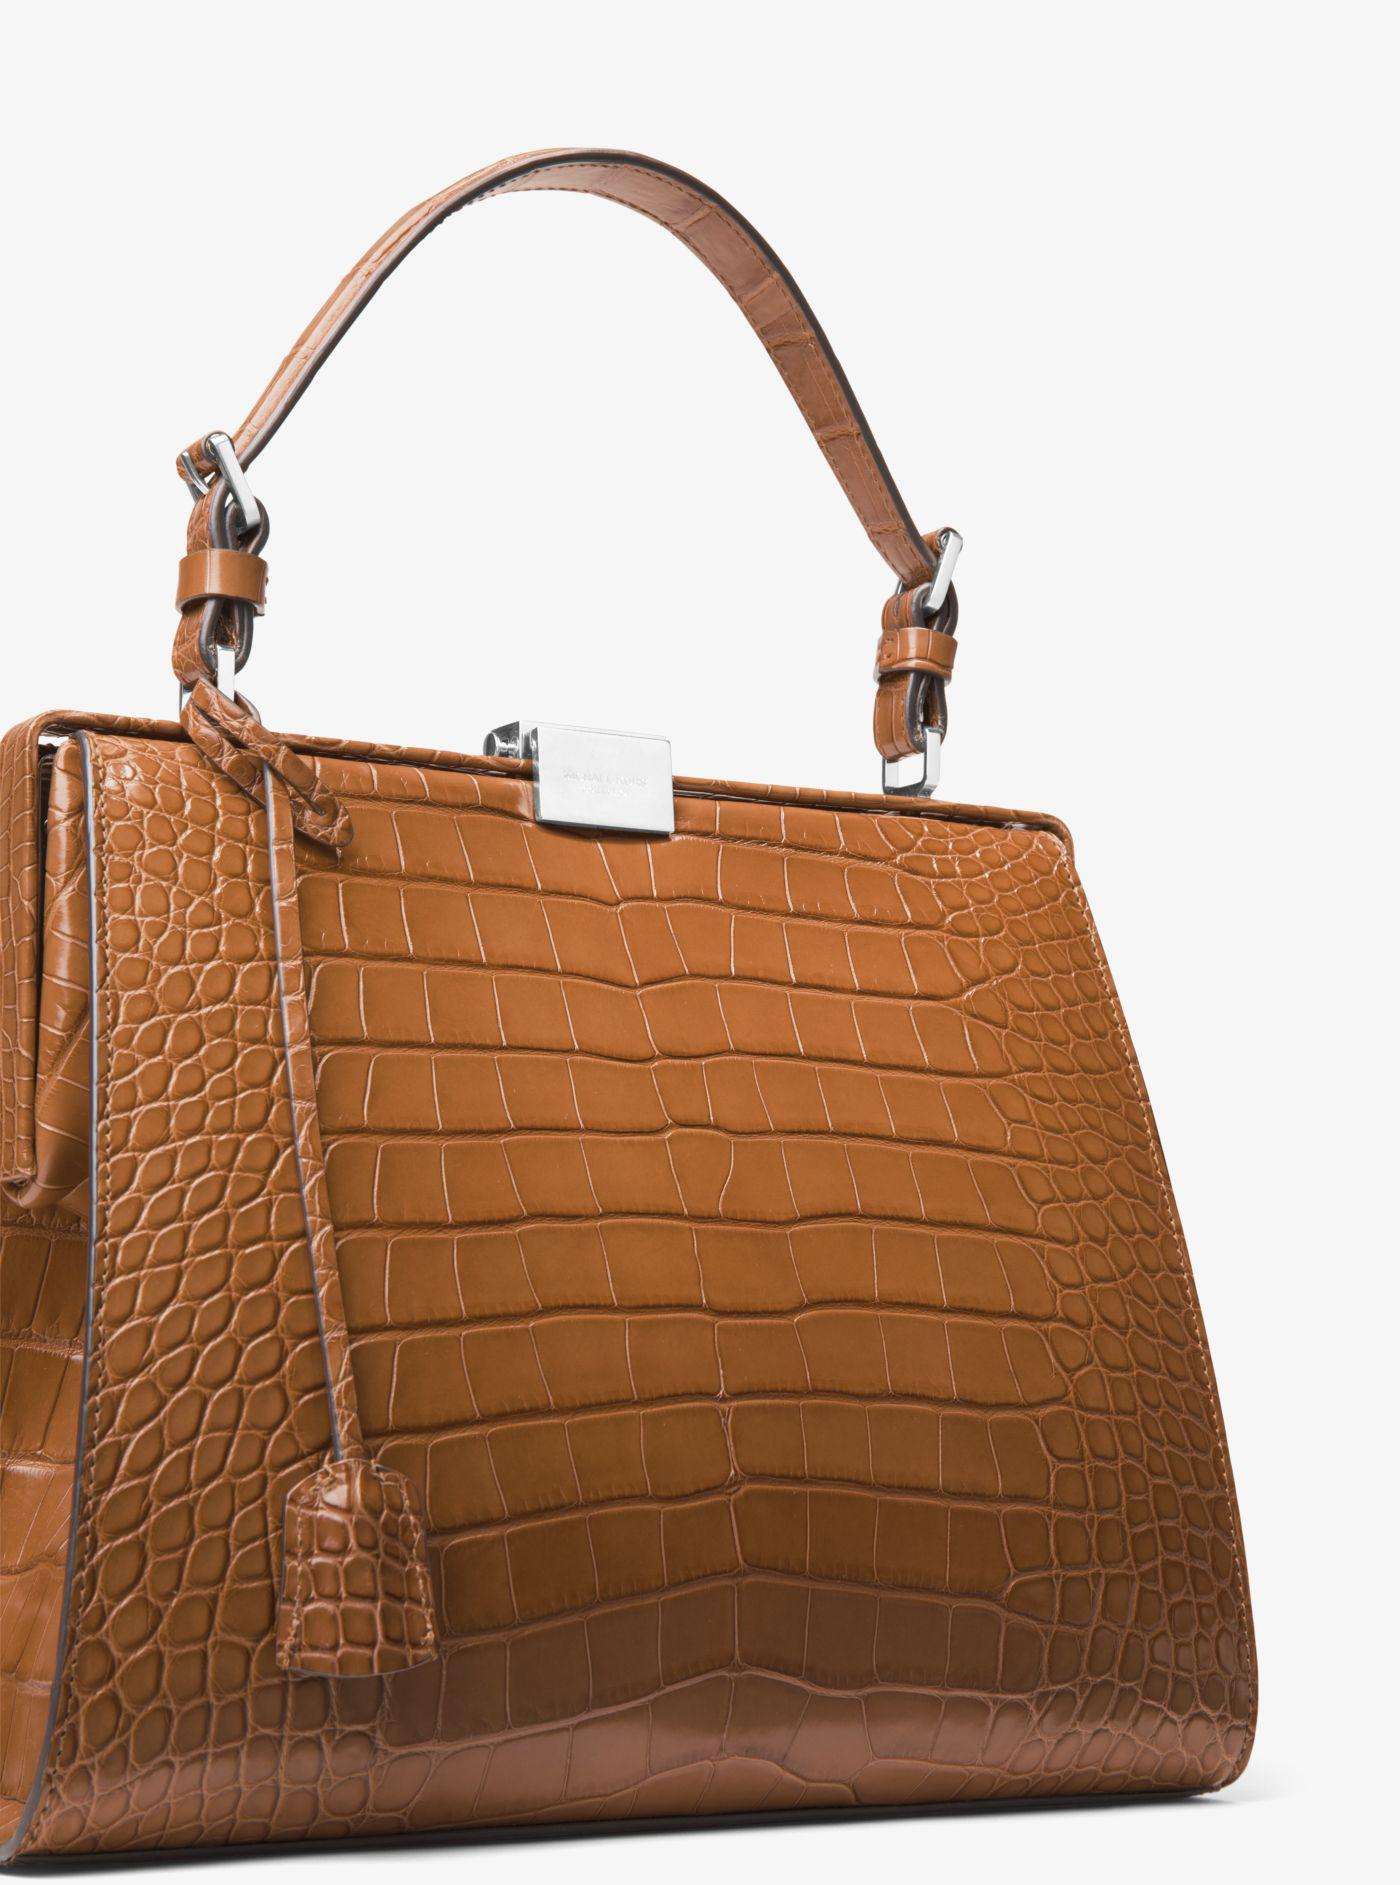 f732d1fb07d7 1e1eb c1267 denmark lyst michael kors gia metallic crocodileembossed  satchel bag in 0fffb 1f3fb cheapest michael kors brown simone alligator top  handle bag ...